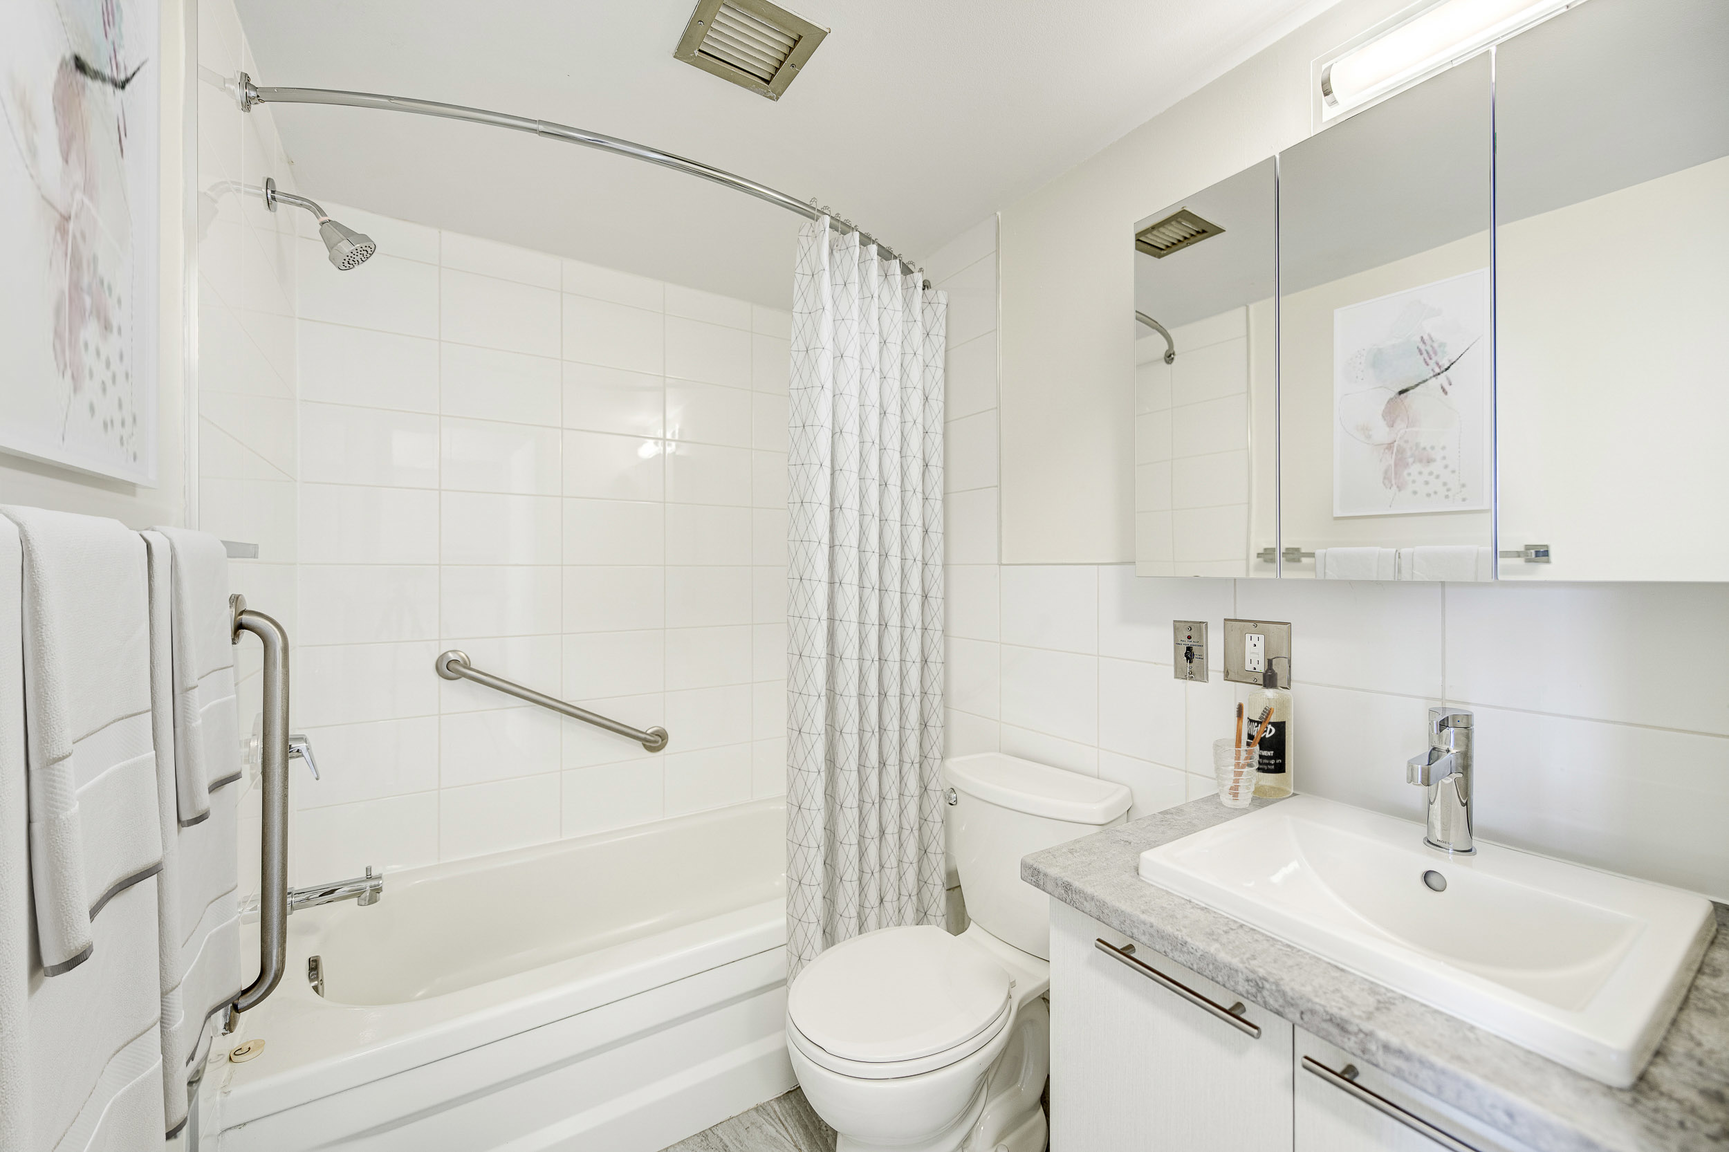 1 bedroom Apartments for rent in Laval at Le Quatre Cent - Photo 05 - RentQuebecApartments – L407183